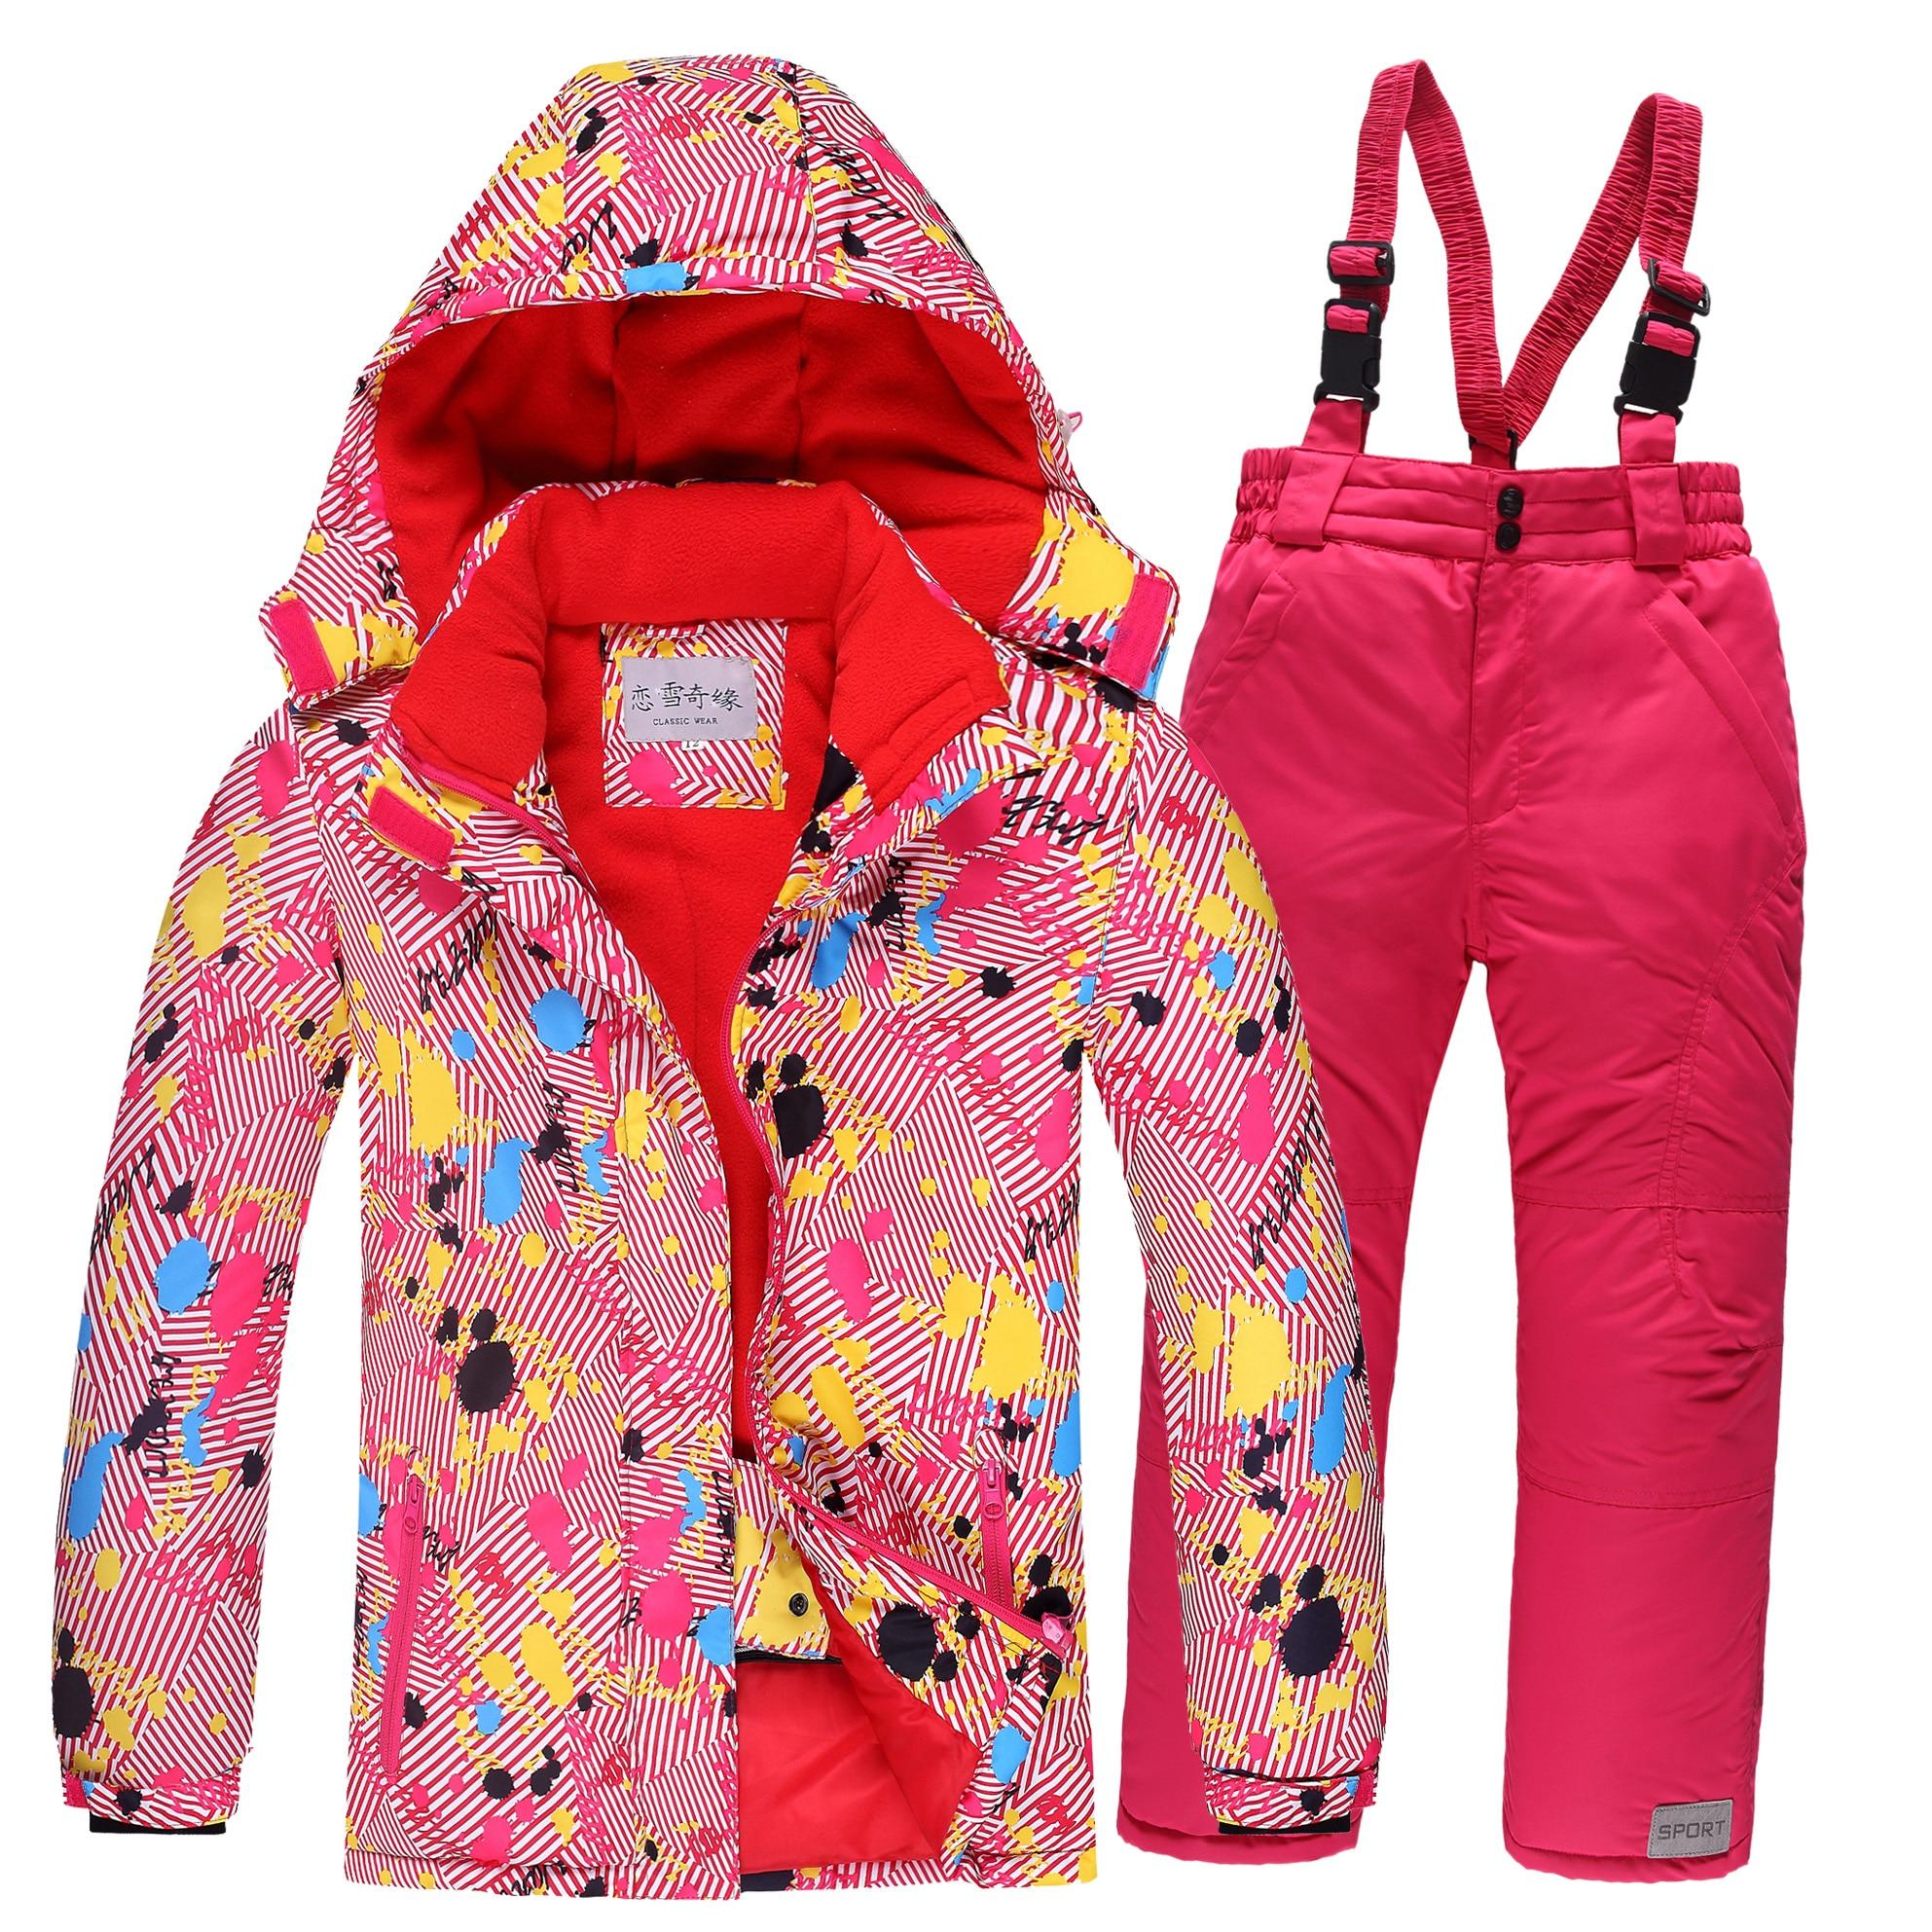 2019 Winter Adult Skiing Jacket  Ski Suit Boys Girls Outdoor Sports Snowboard Set Waterproof Kids Clothing Warm Windproof